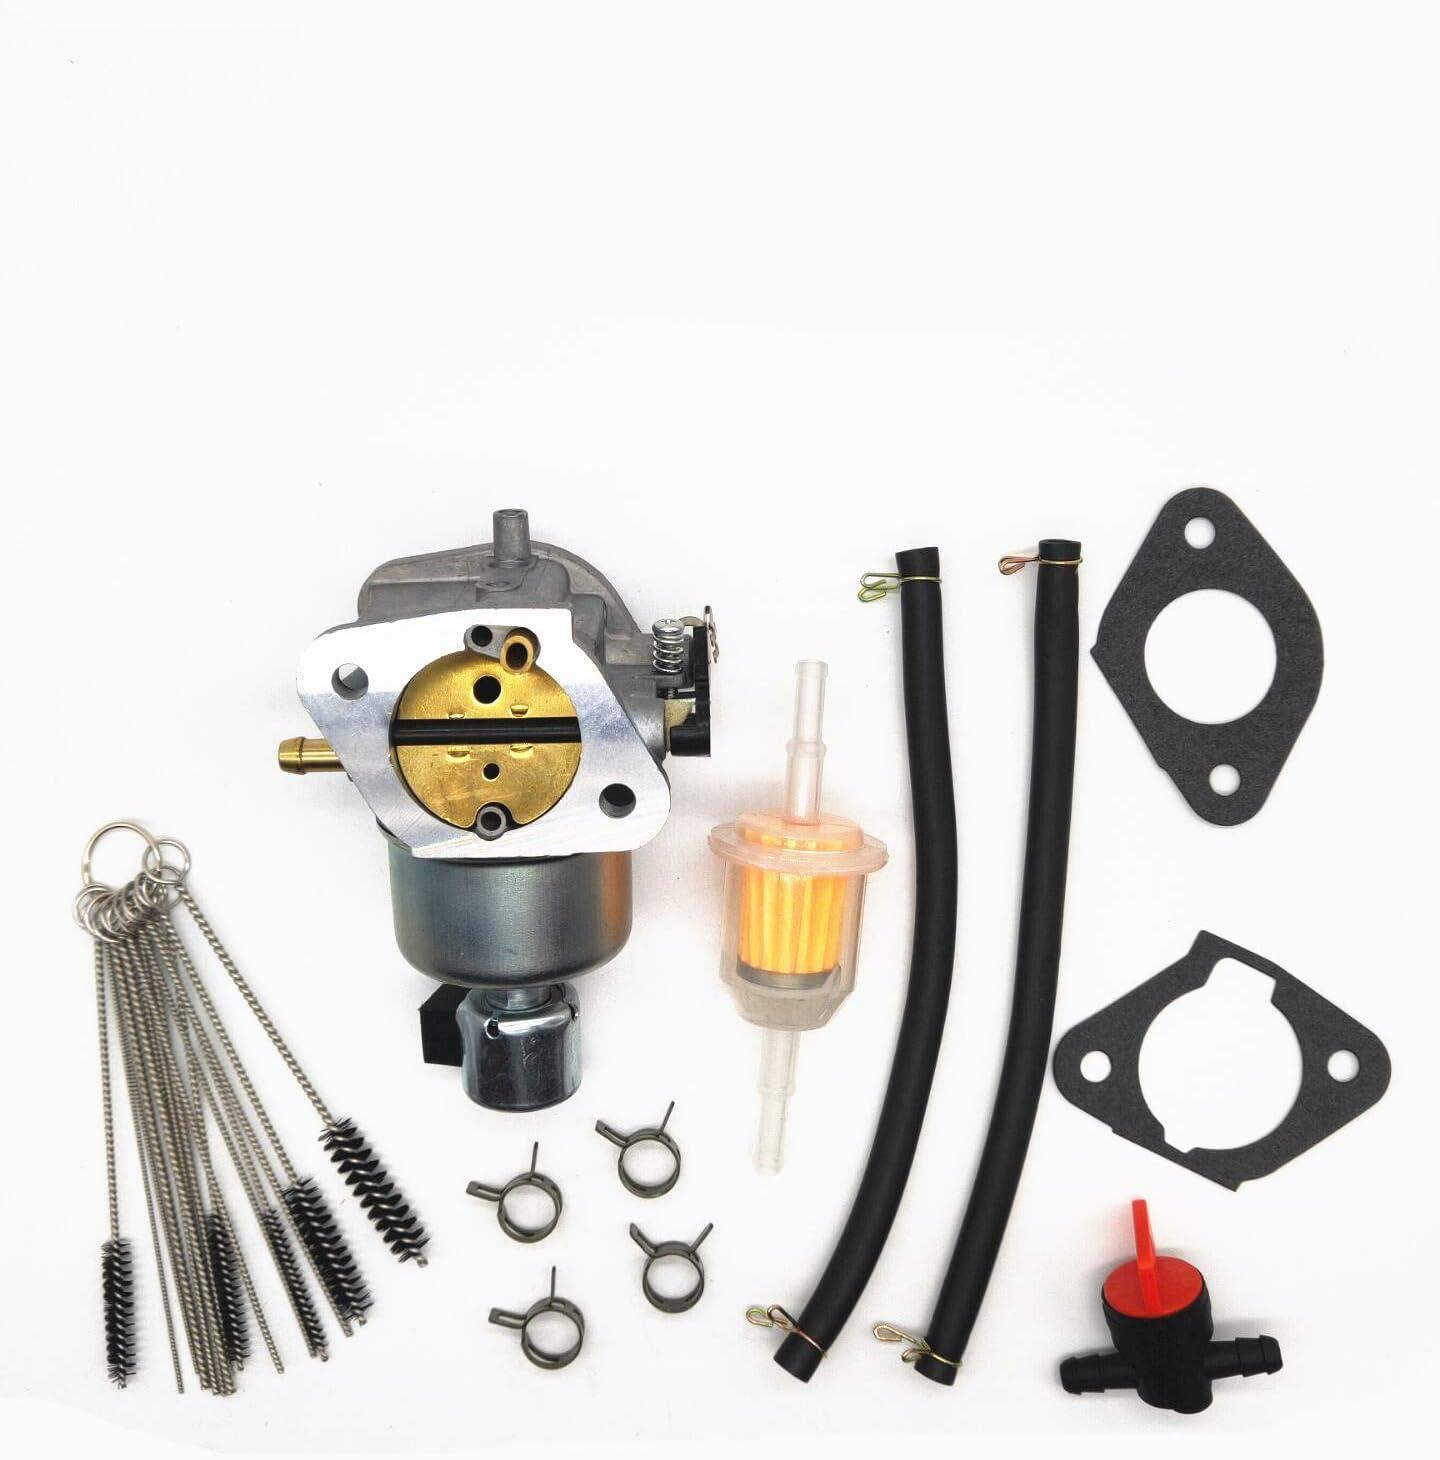 QMOKO 15004-0986 Carburetor for Free shipping anywhere in the Atlanta Mall nation Kawasaki Carb Genuine